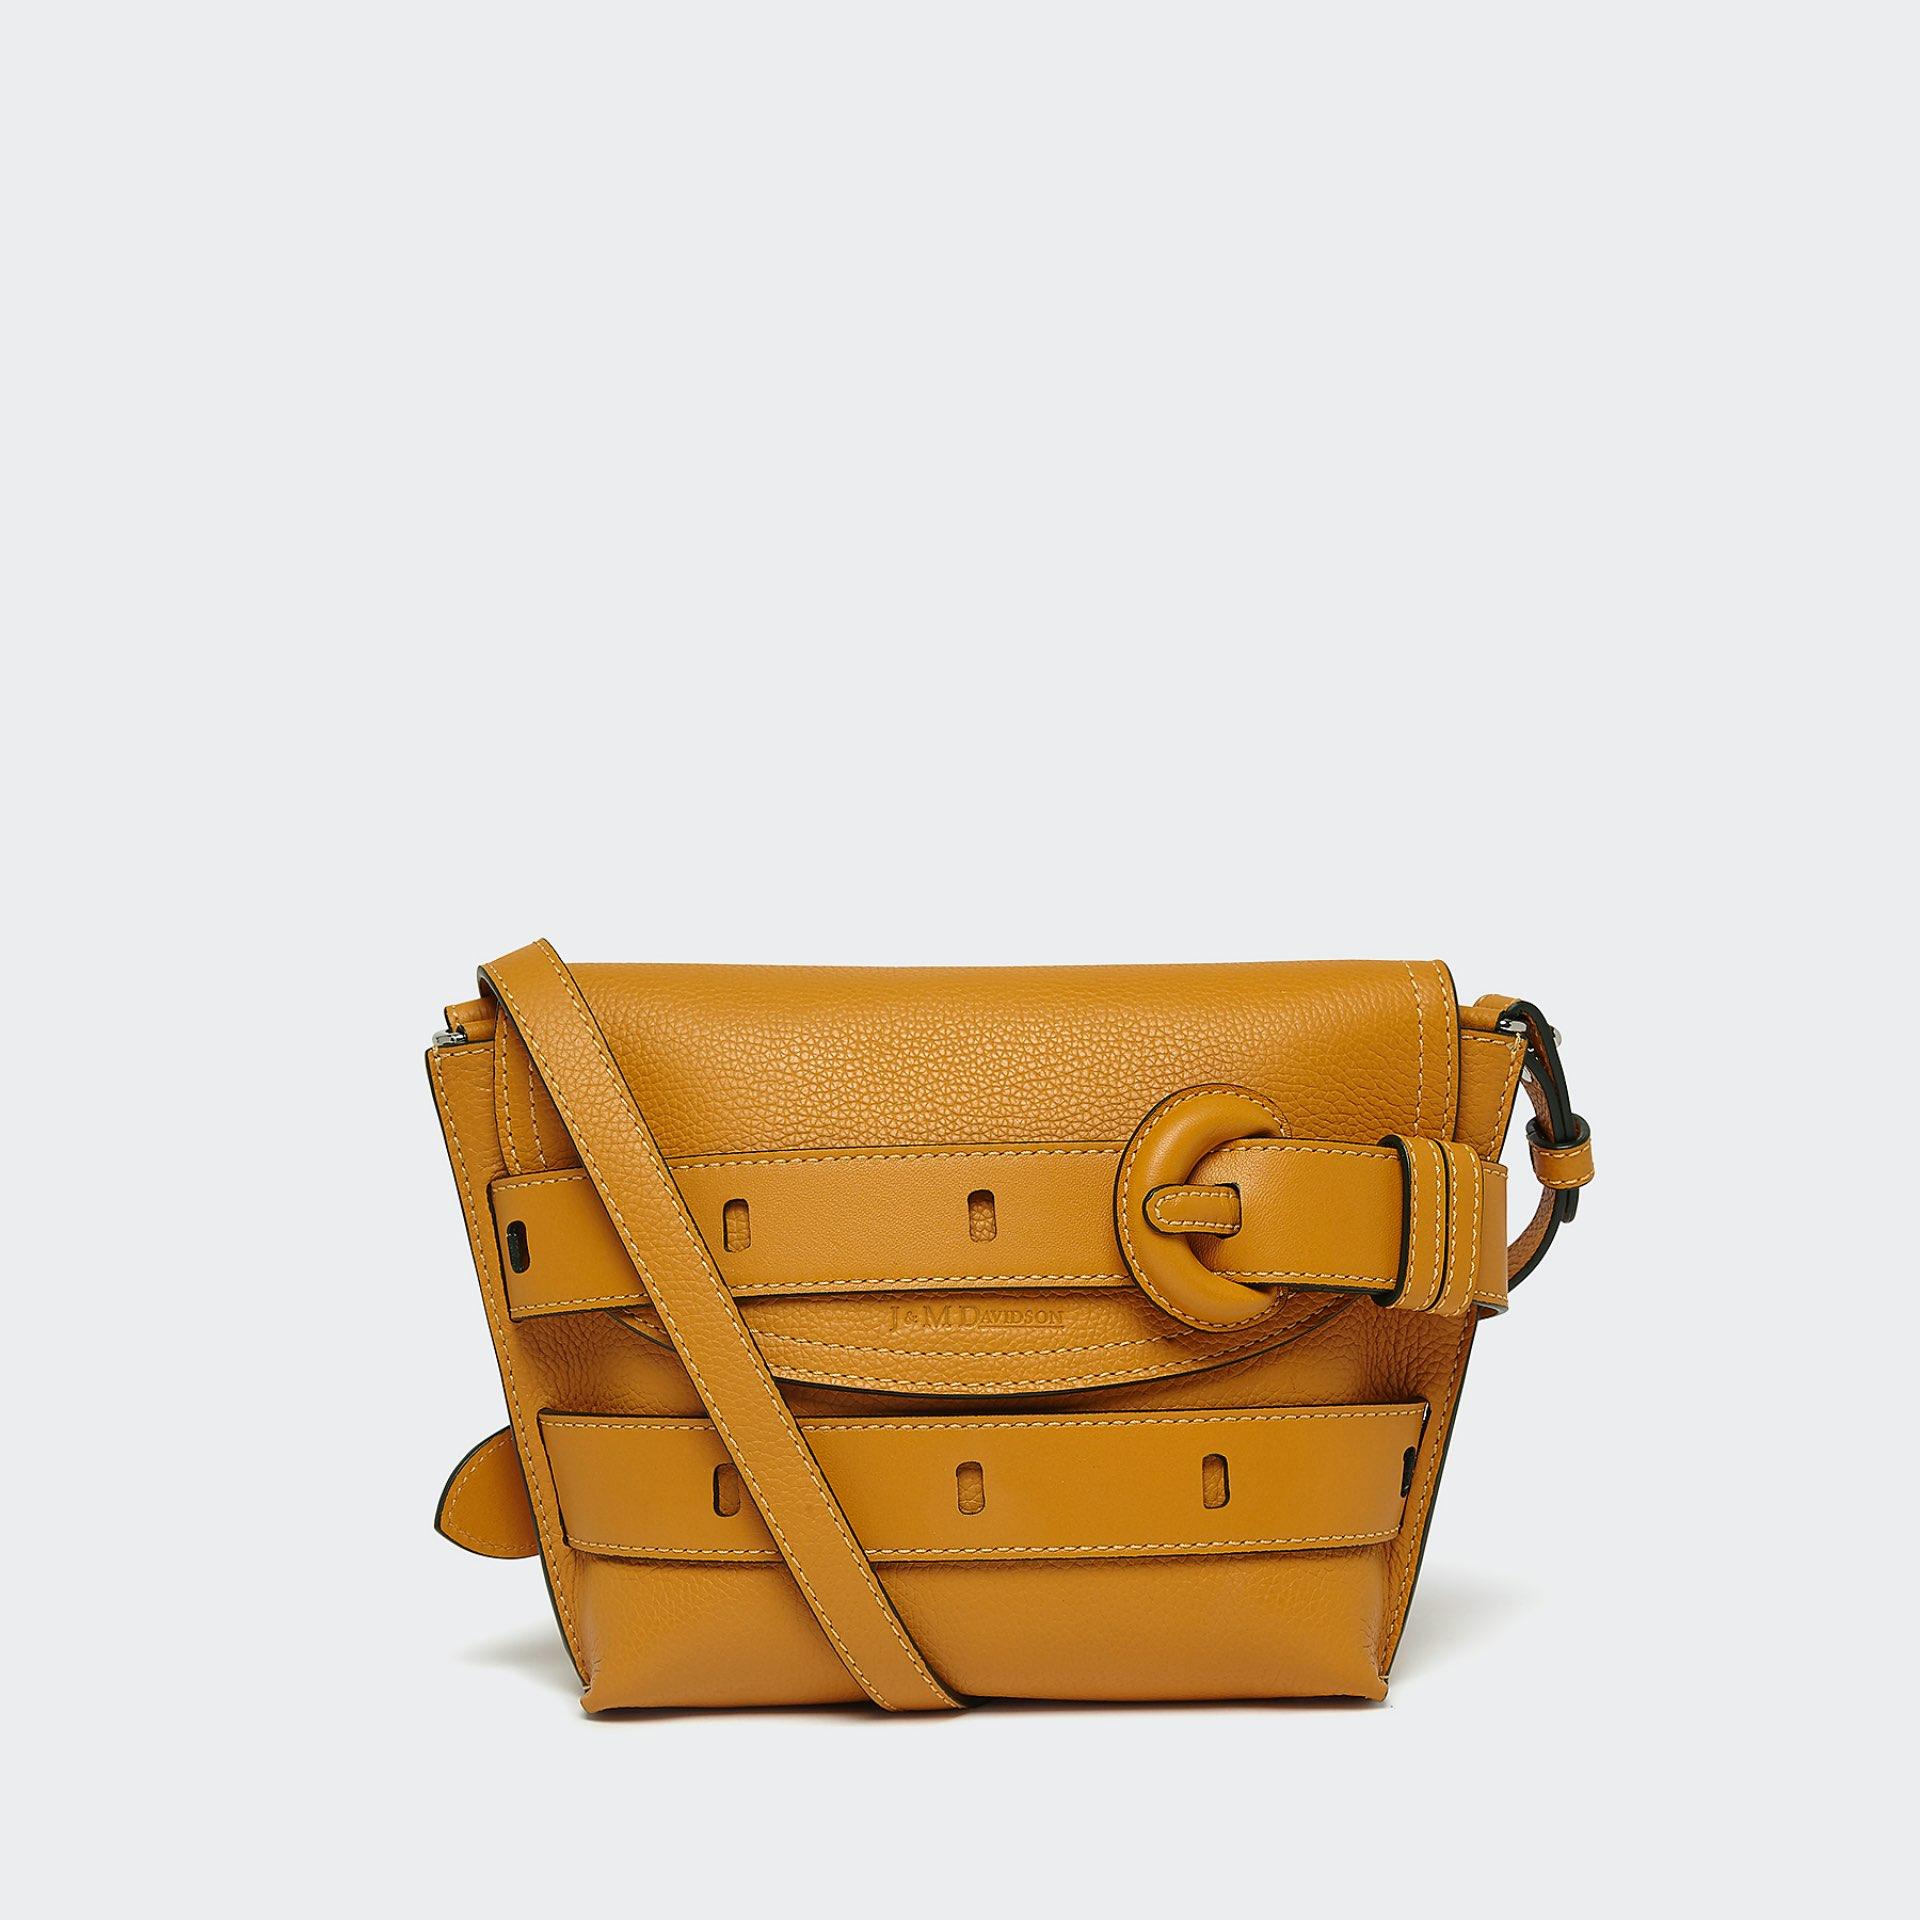 J&M mustard yellow small handbag from the front